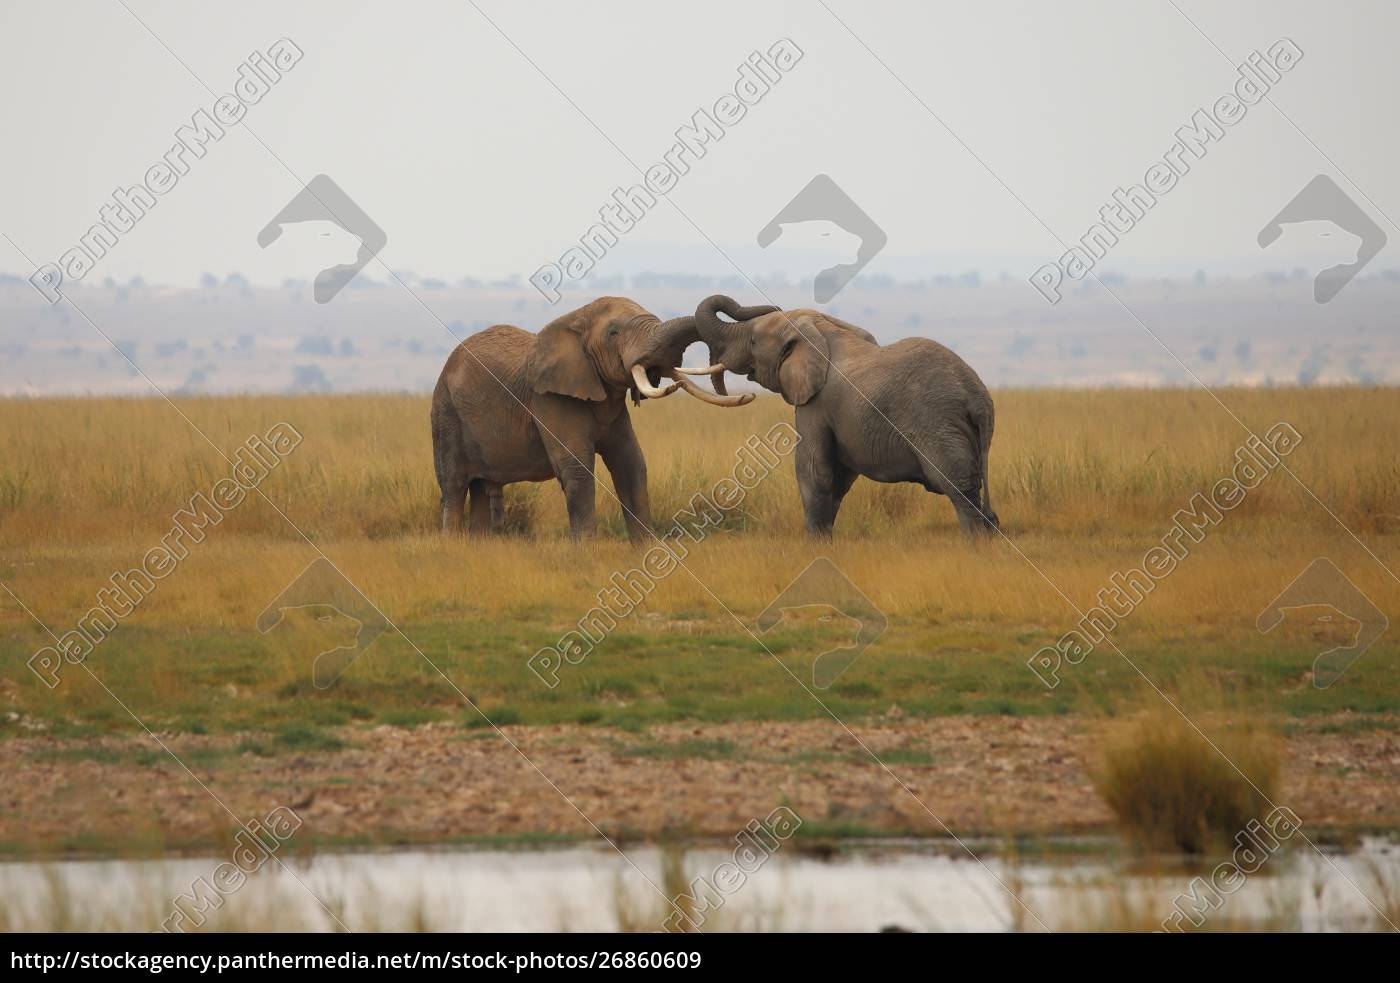 two, elephants, measure, their, strength - 26860609